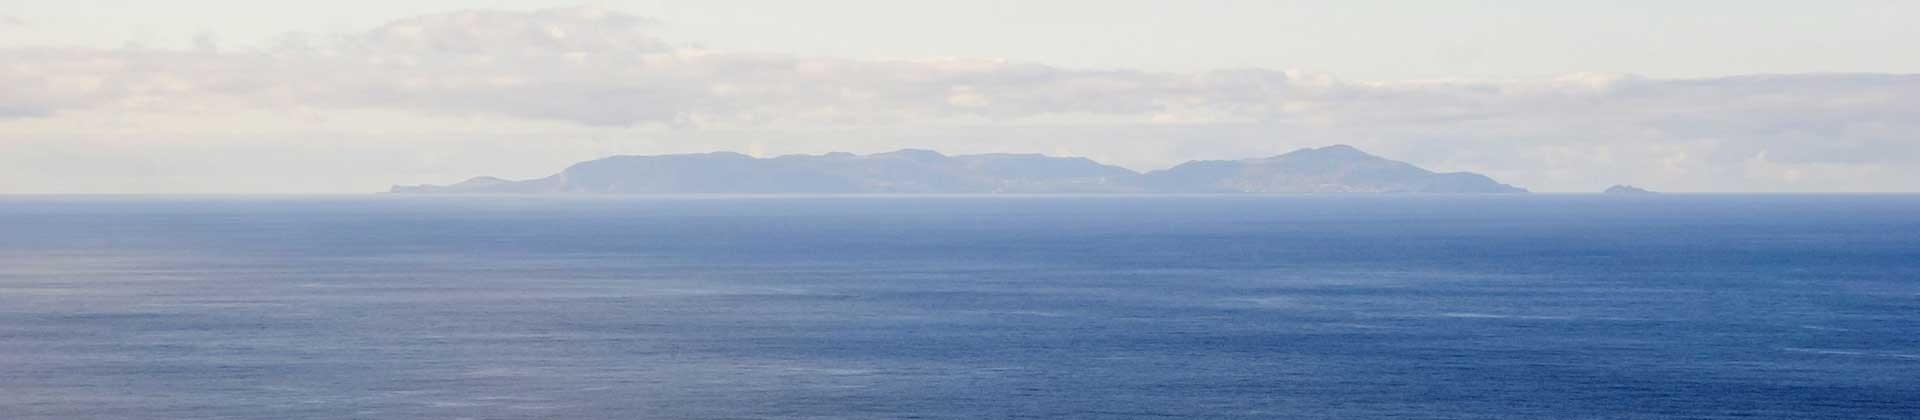 Ocean & island